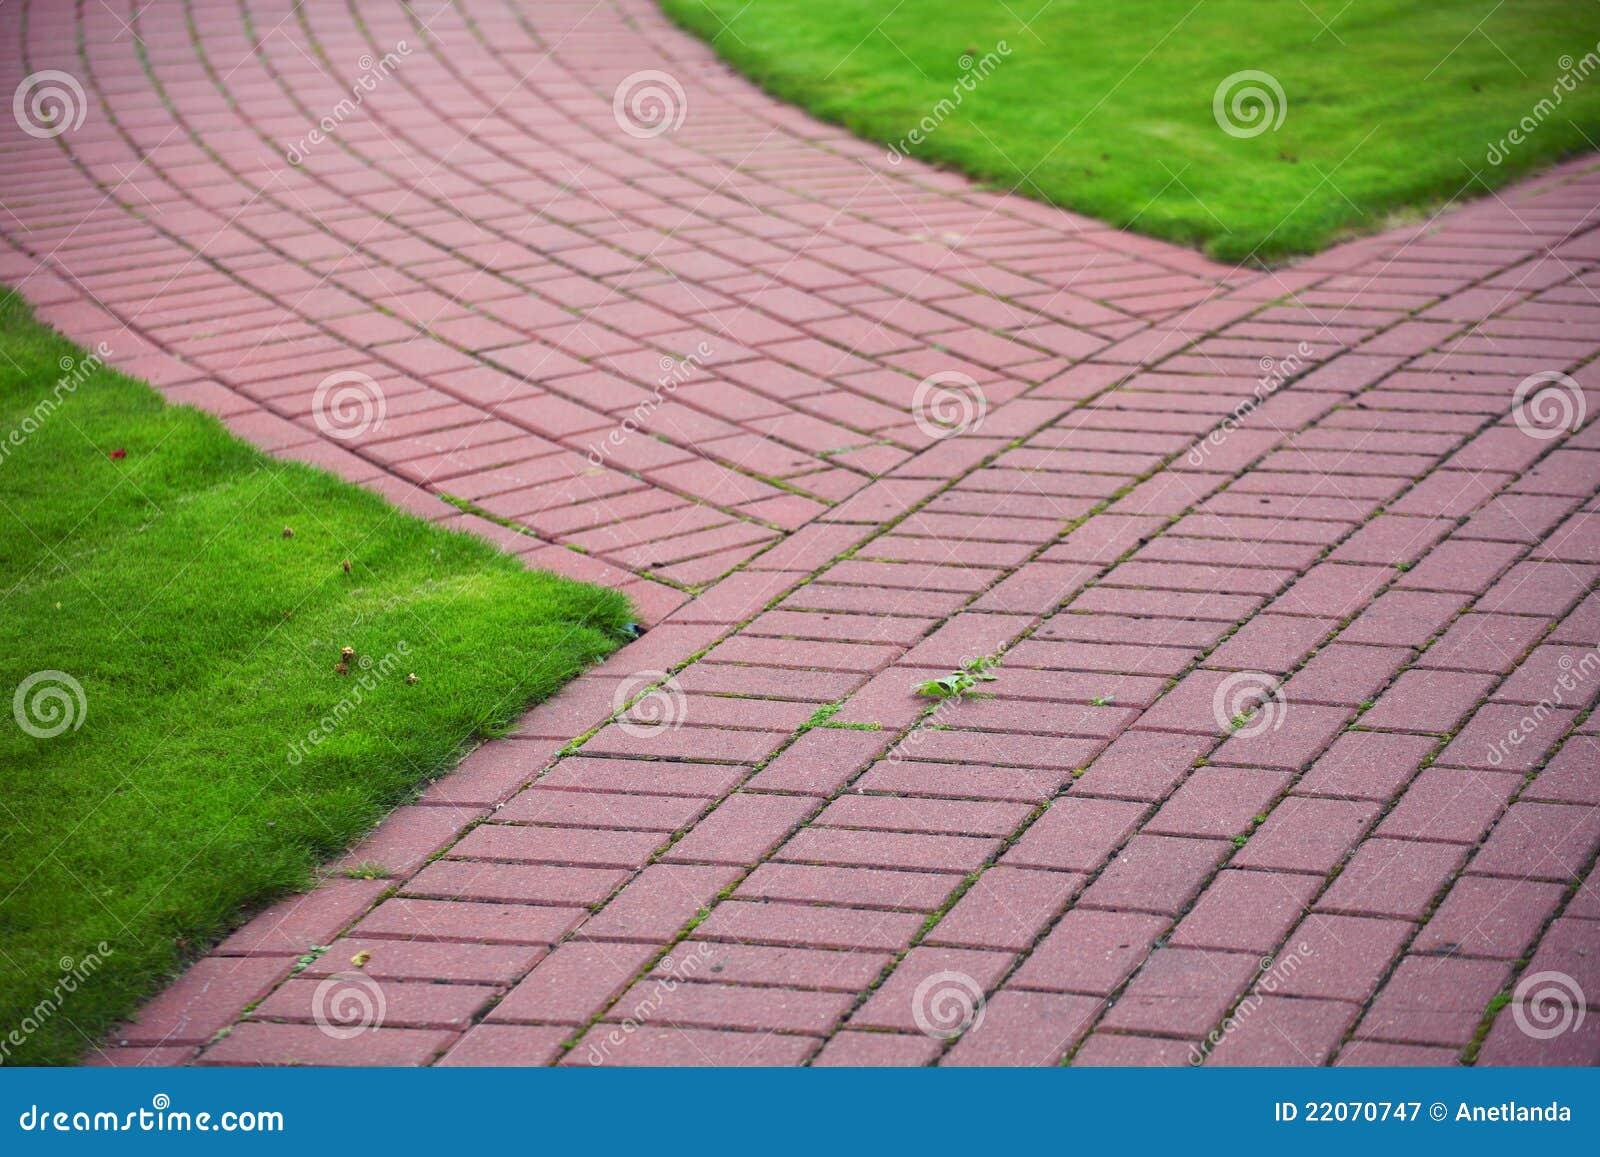 pedras para jardim em sorocaba:Stone Garden Path with Grass